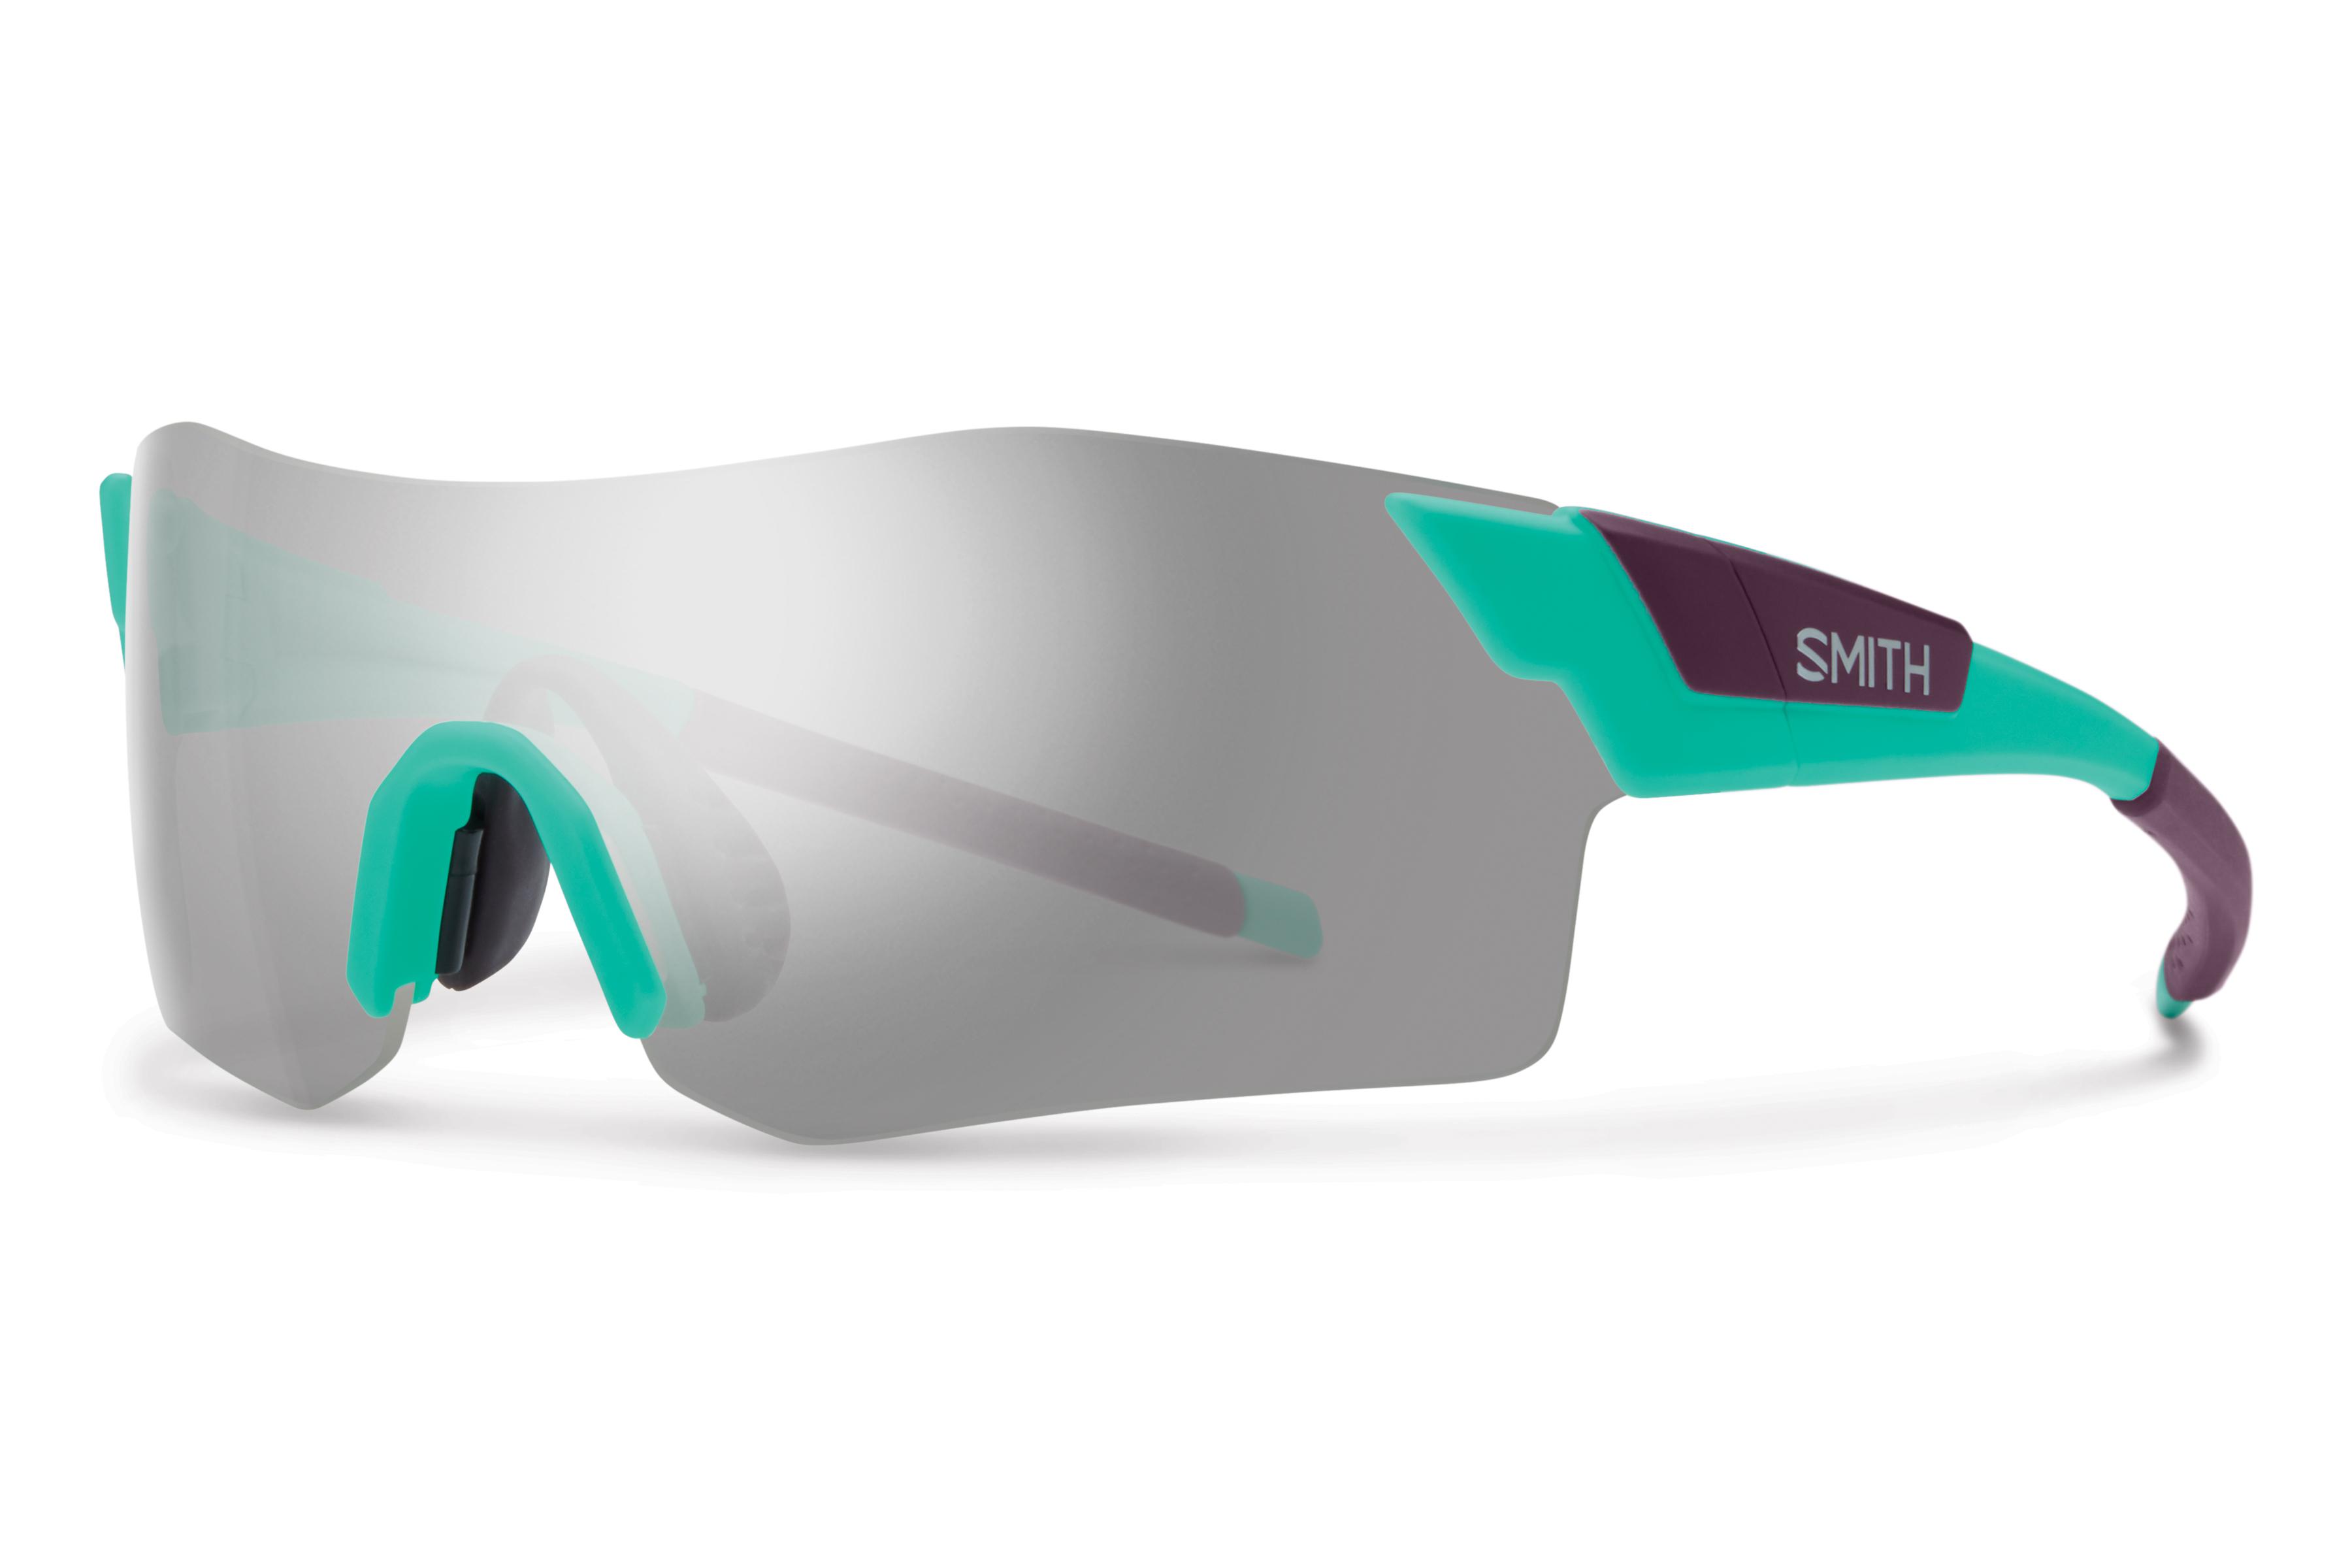 99a7f6a63b Cycling sunglasses